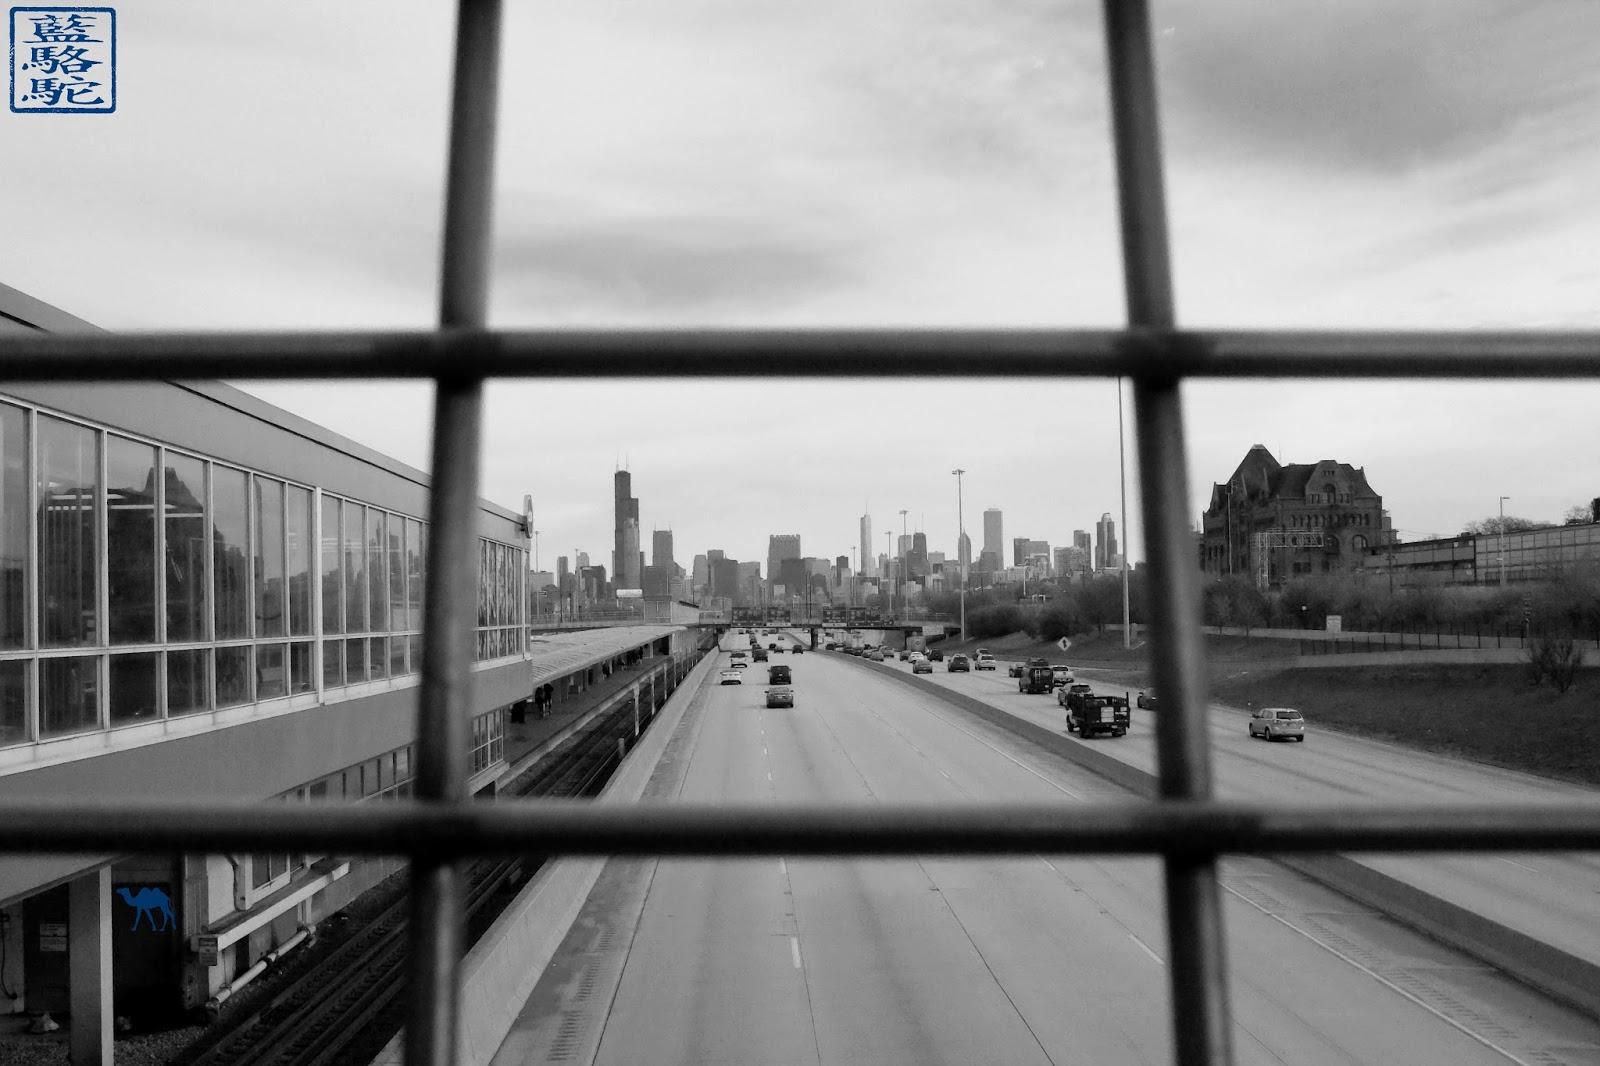 Le Chameau Bleu - Blog Voyage Chicago USA -  Chicago et sa skyline